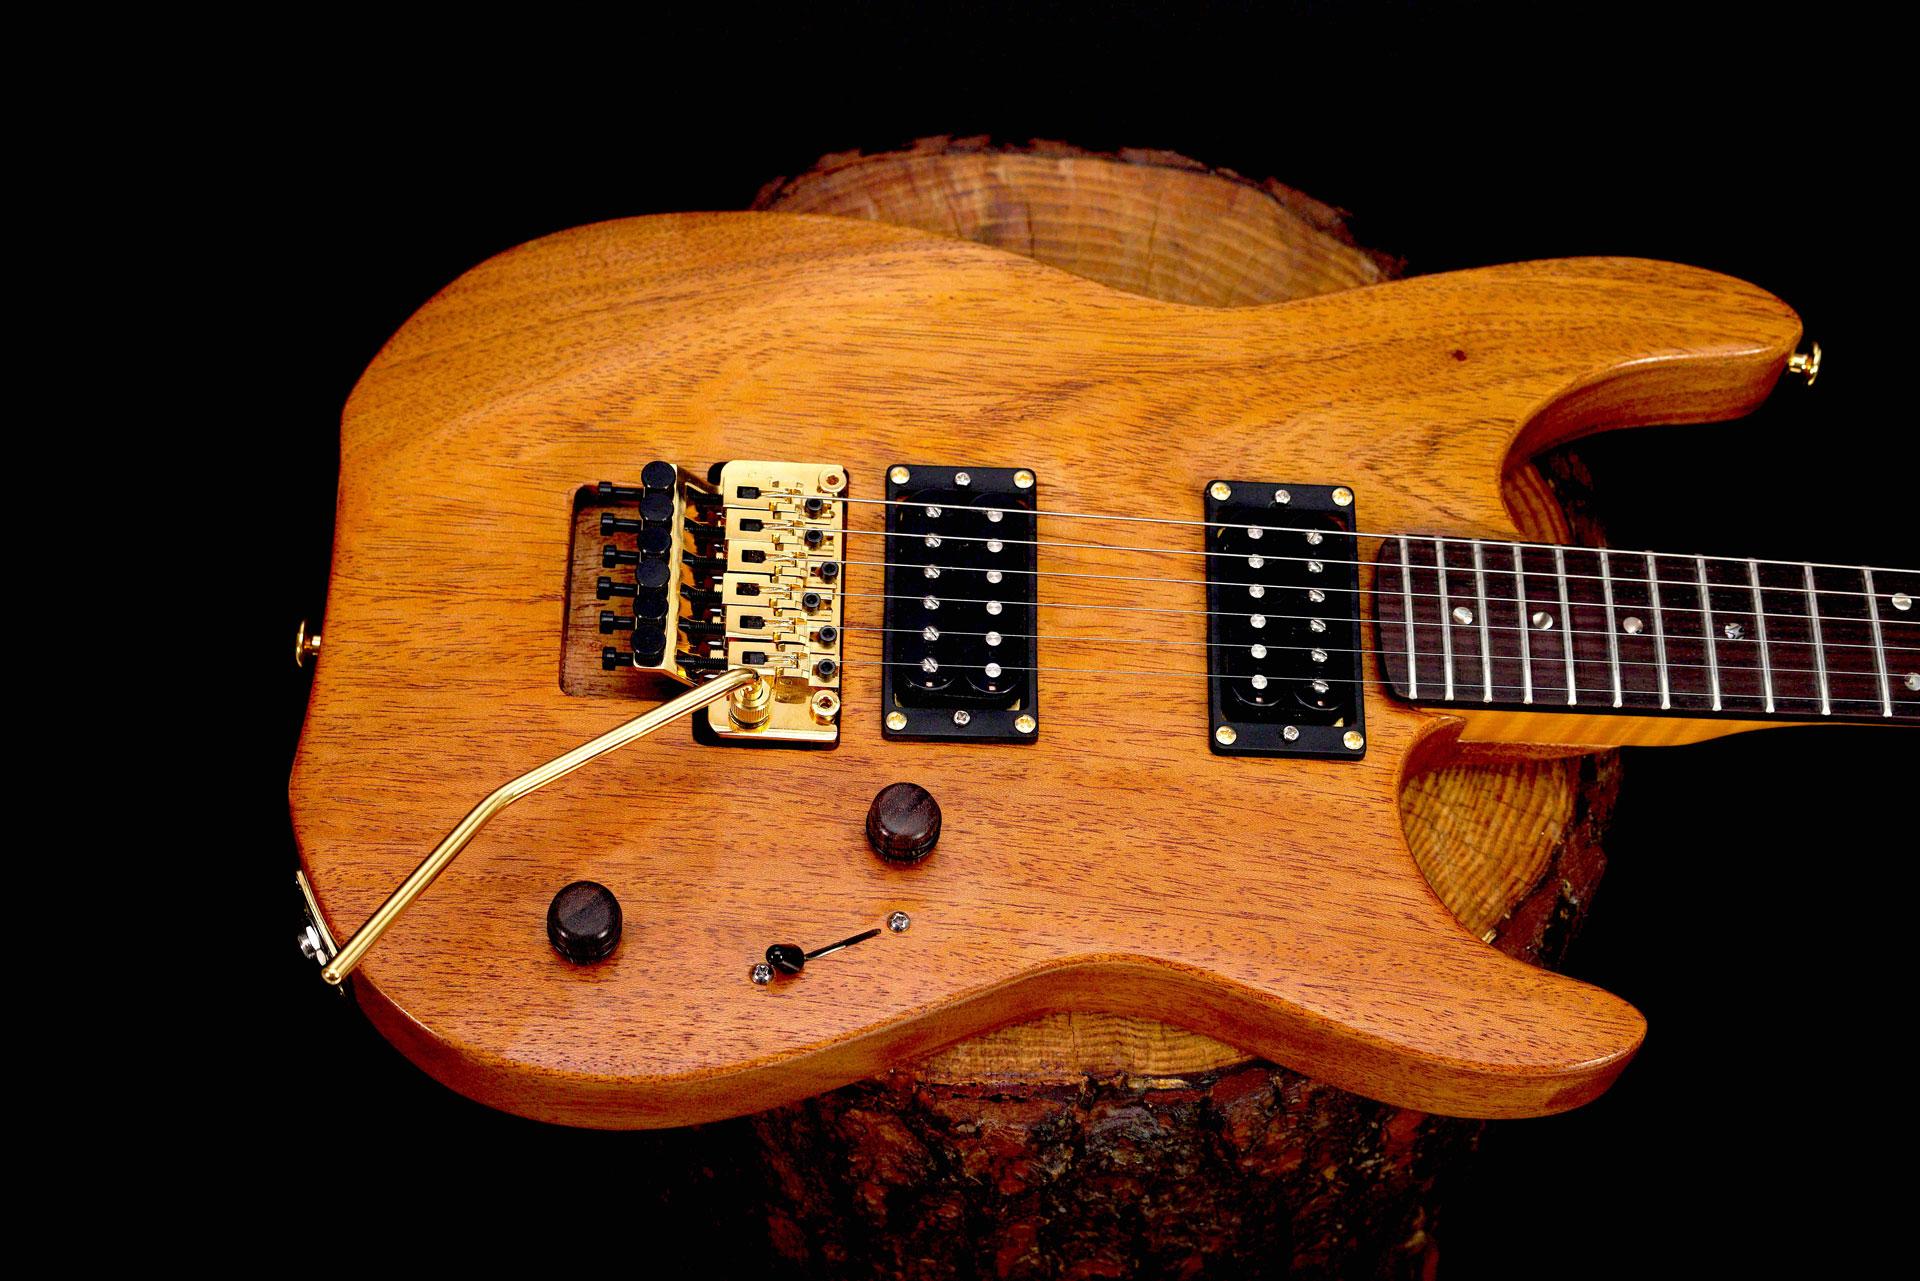 Verve Exotic Series - Verve Guitars